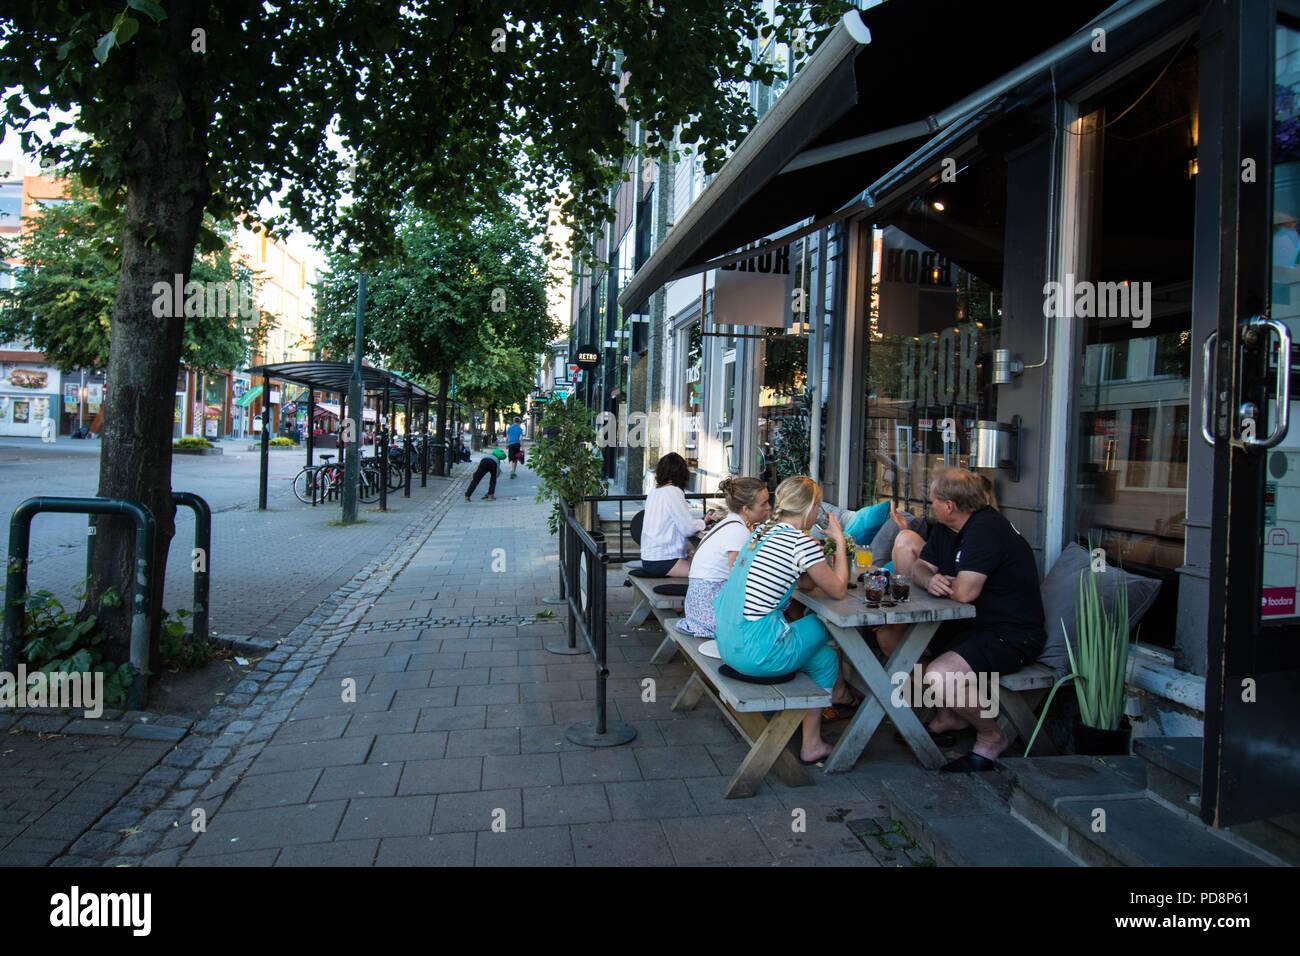 9a048456 Trondheim Restaurant Stock Photos & Trondheim Restaurant Stock ...